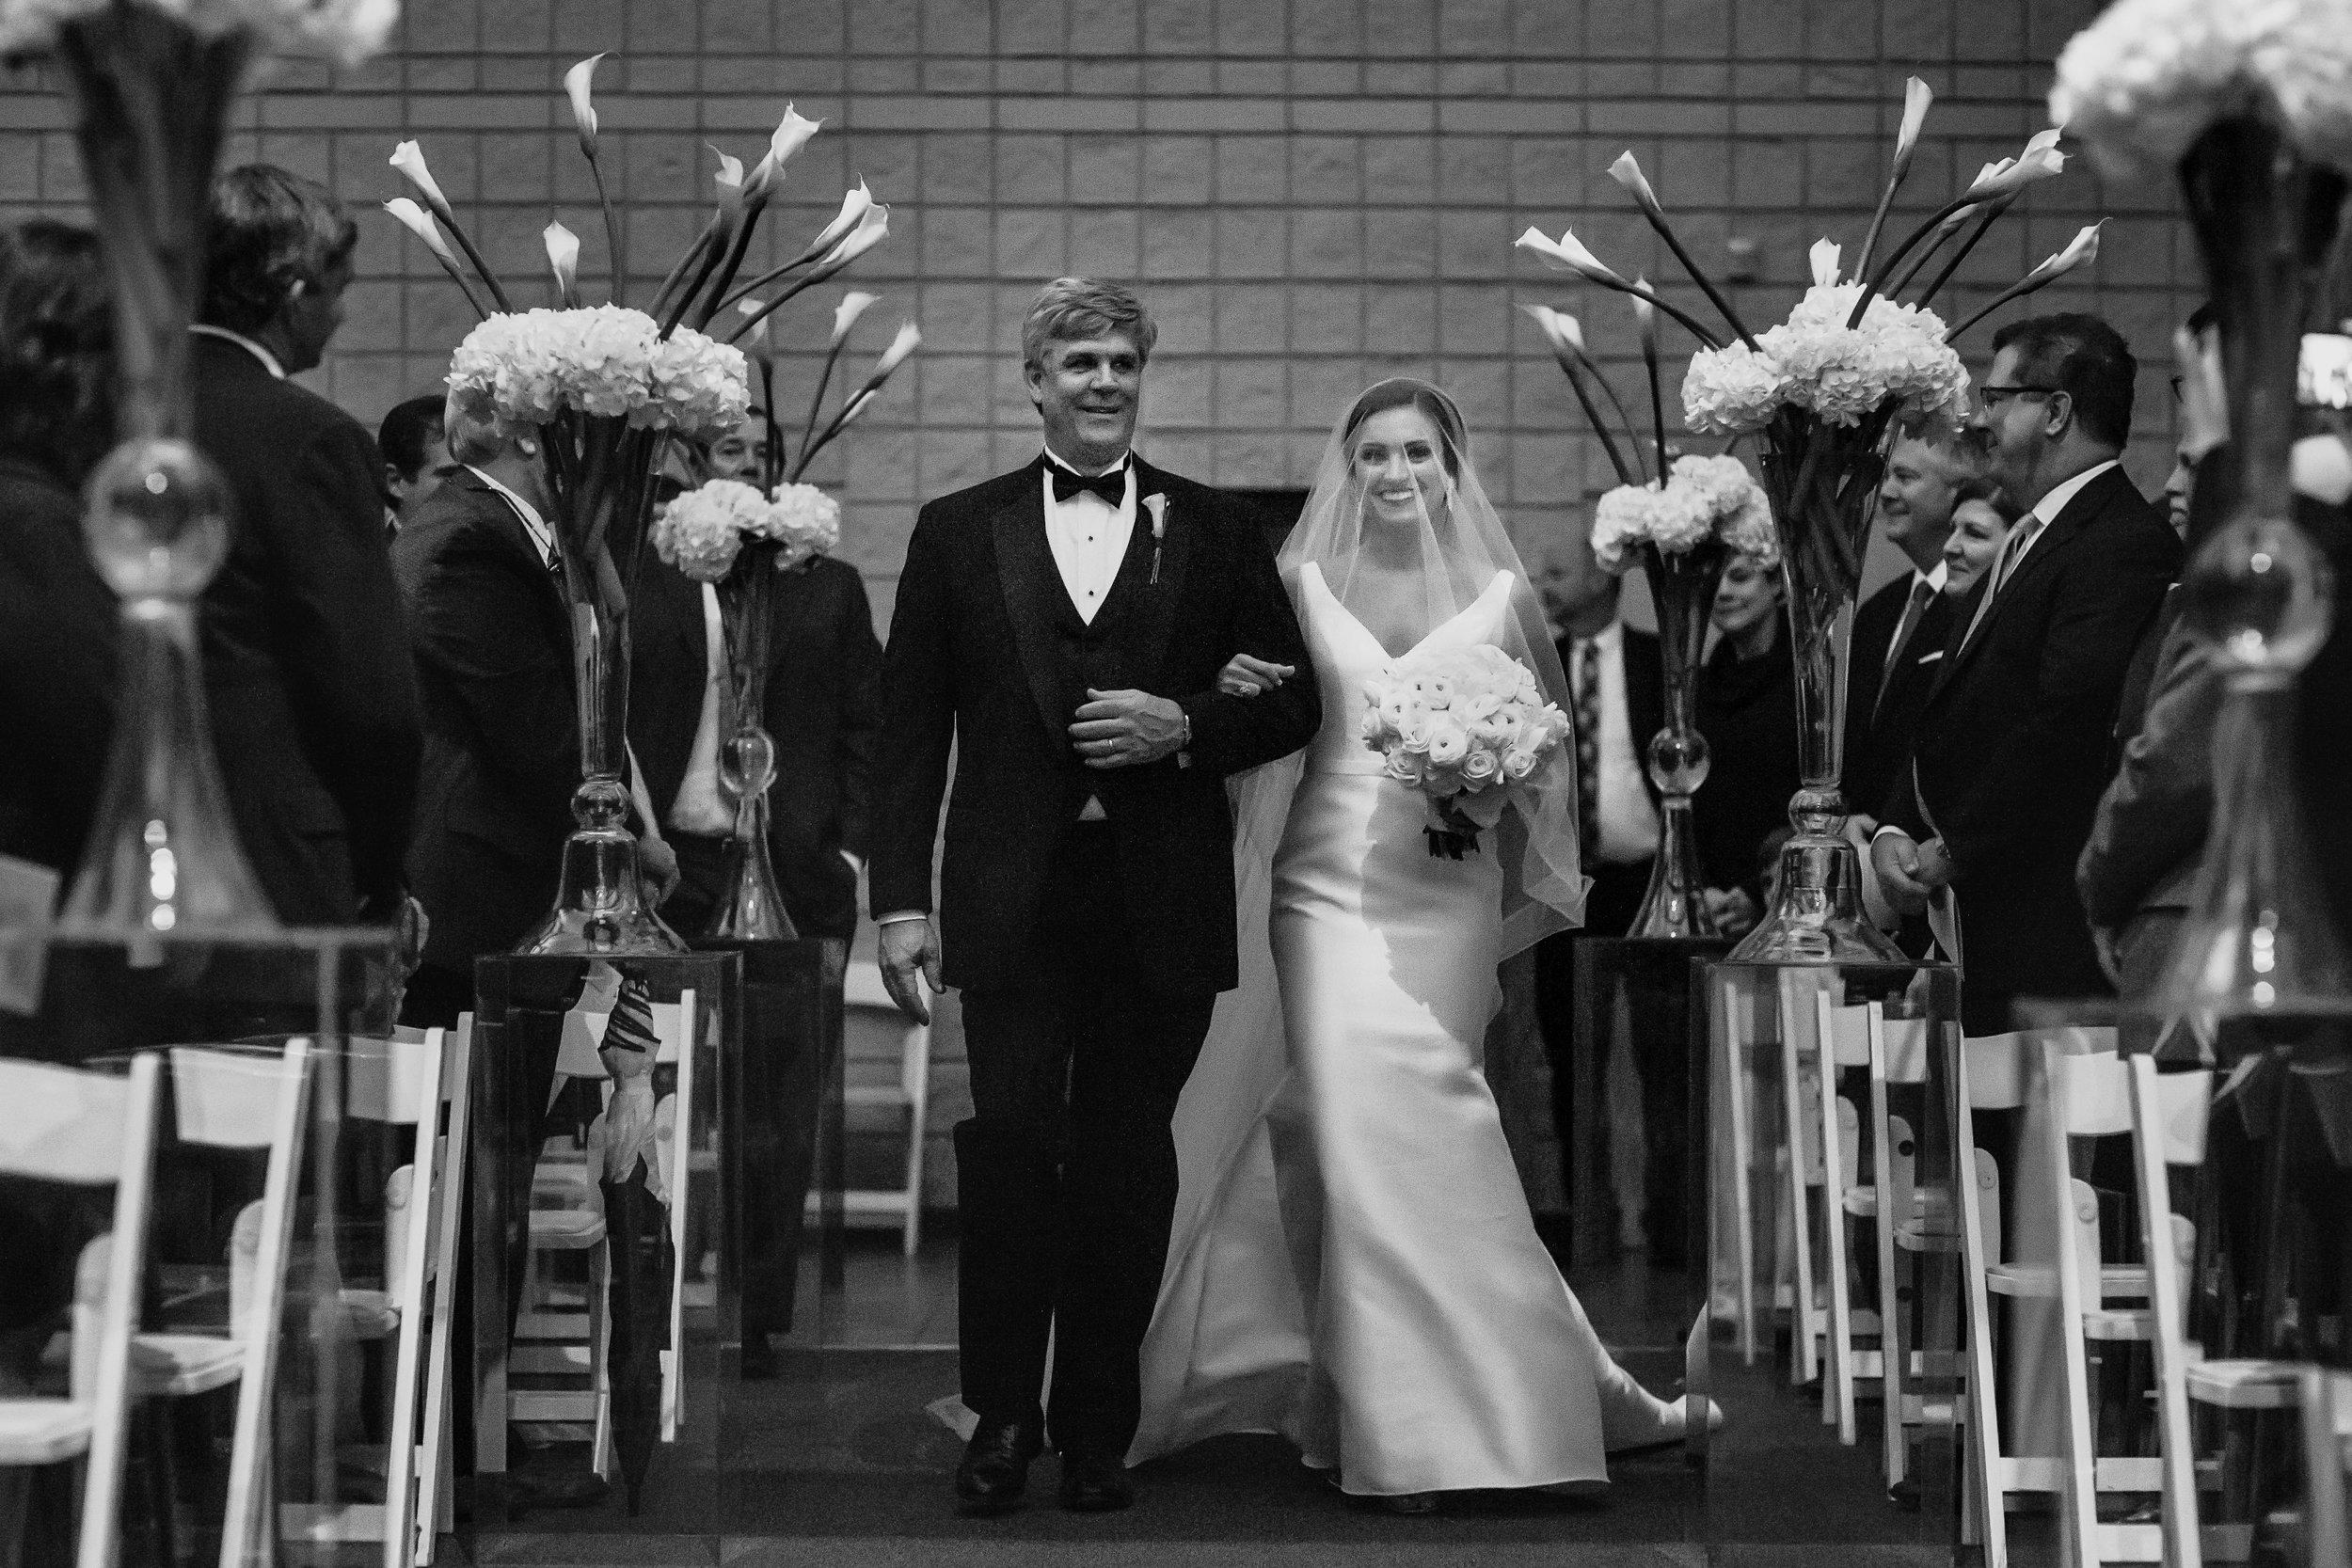 wedding923bw.jpg